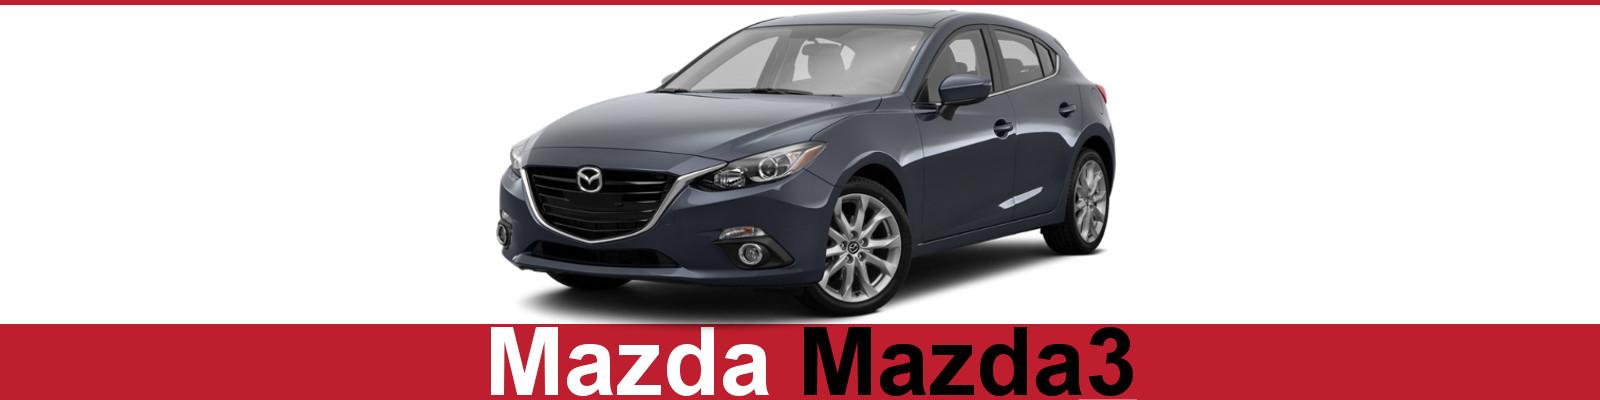 Mazda Dealer New Braunfels >> Mazda Cars | San Antonio TX